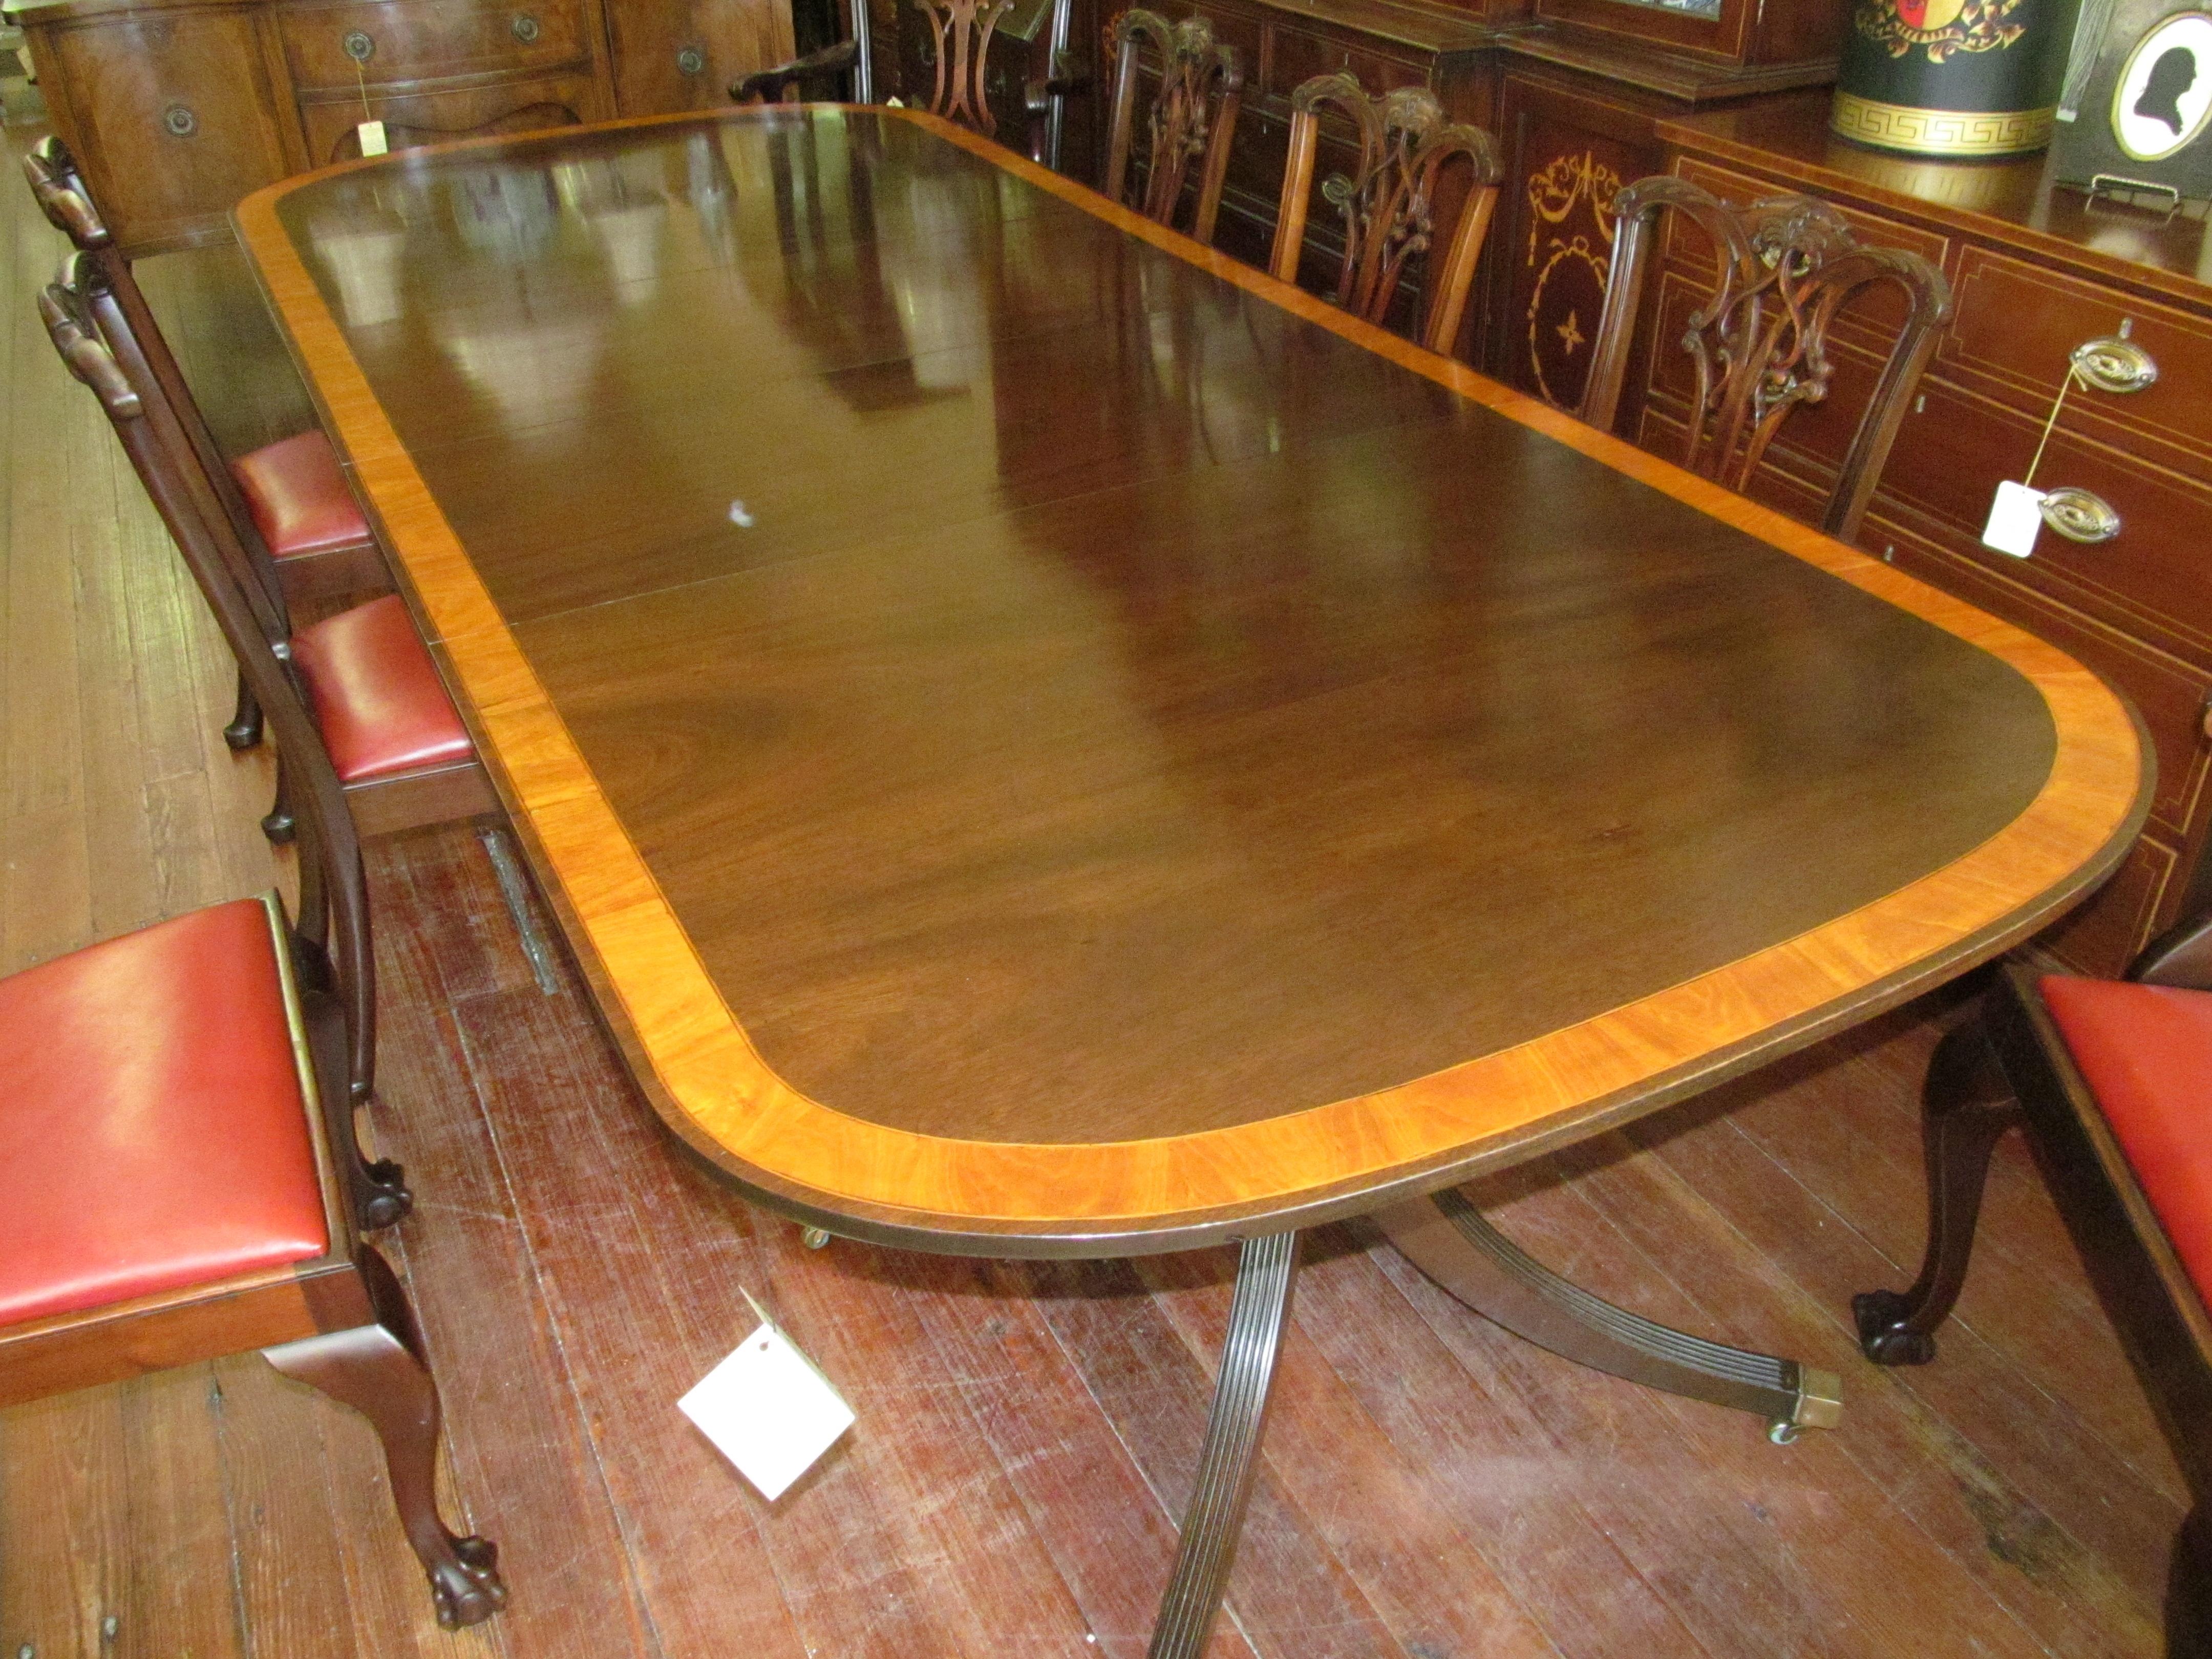 Fine mahogany dining tables - Antique English Mahogany Satinwood Crossbranded Sheraton Style 2 Pedestal Dining Table